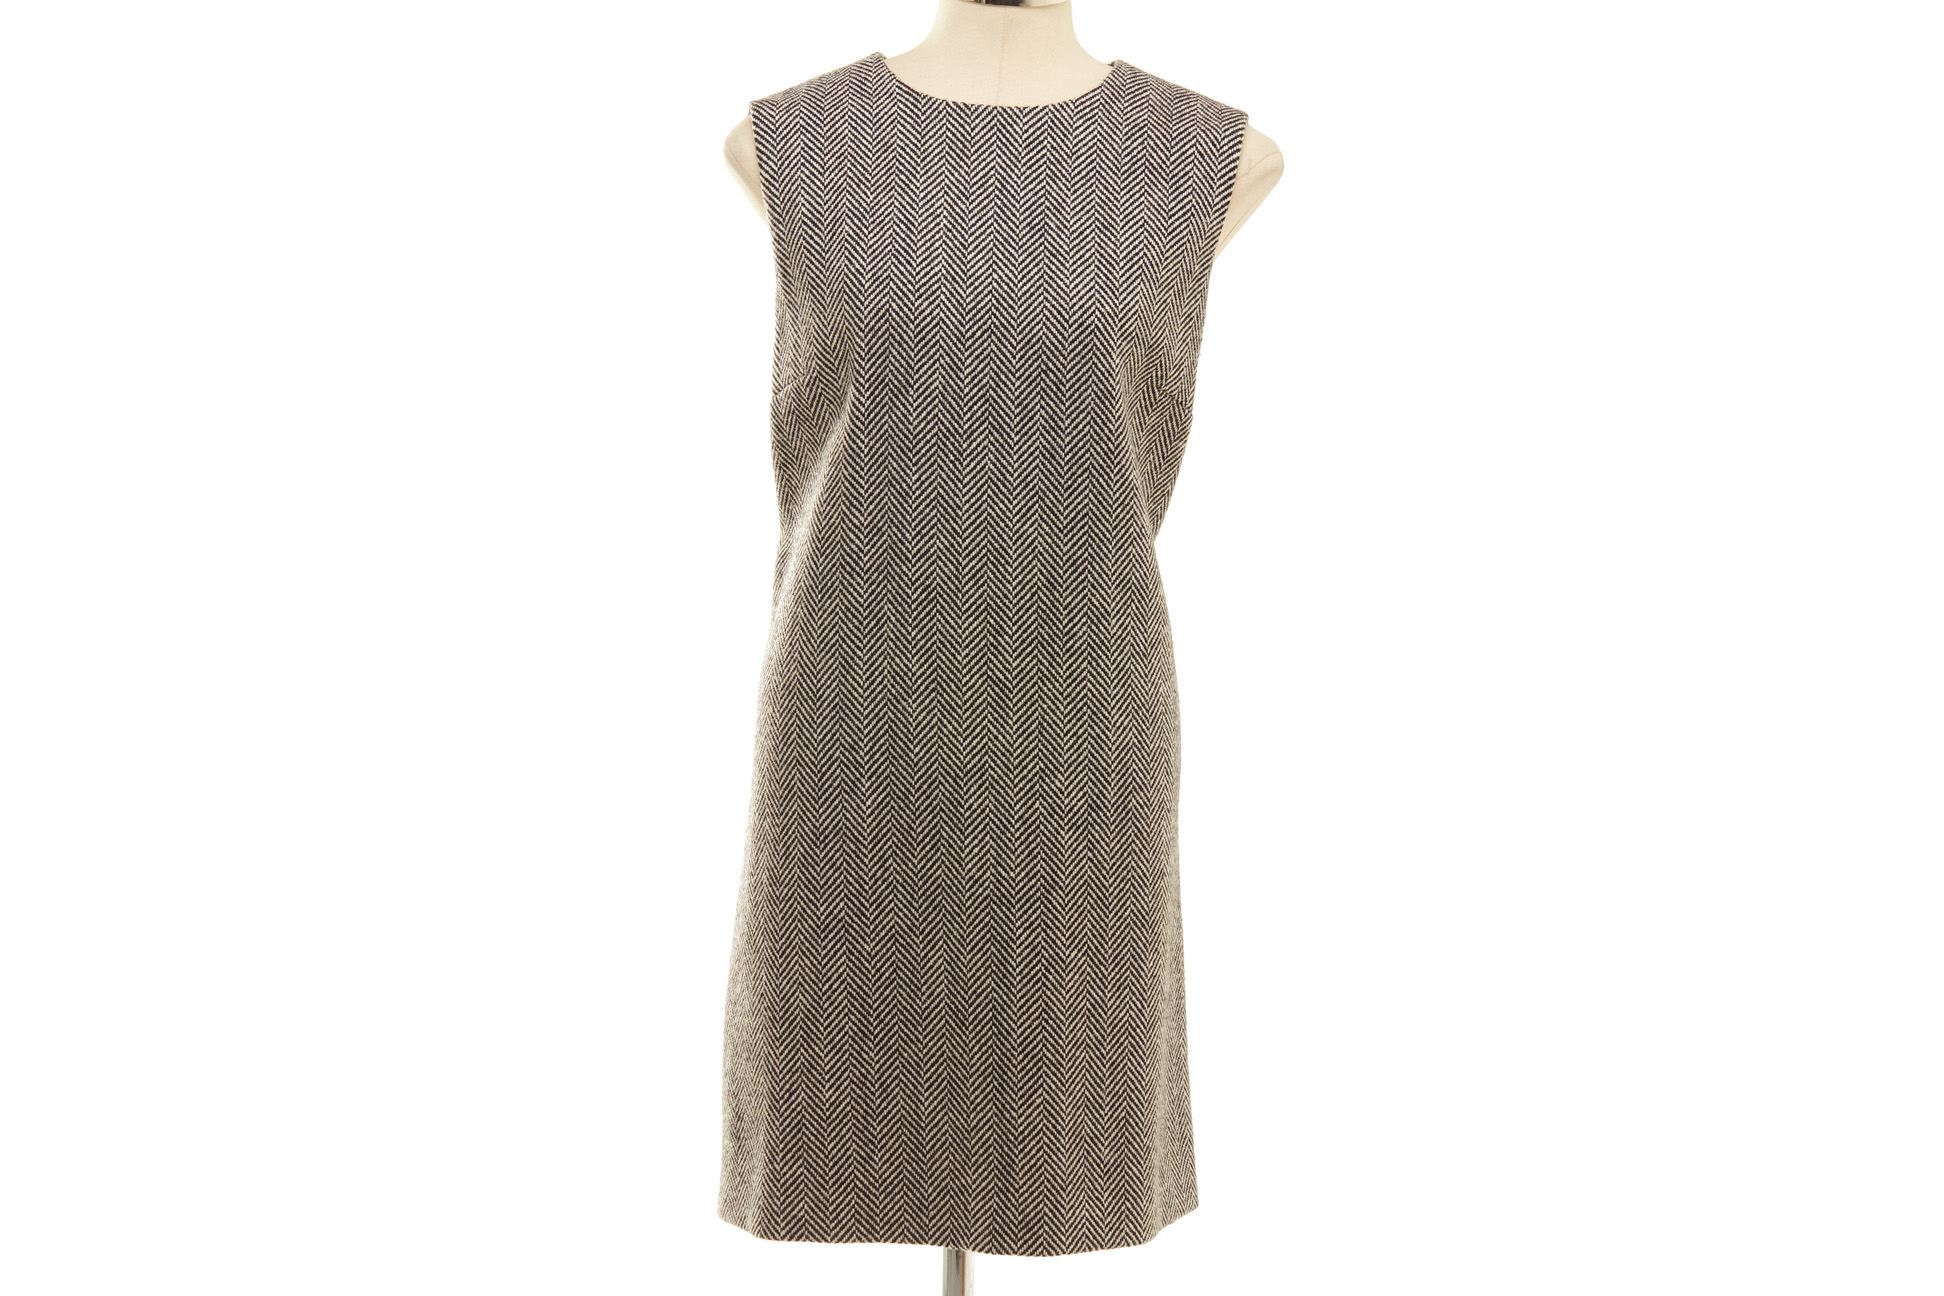 A DOLCE & GABBANA GREY HERRINGBONE TWEED DRESS